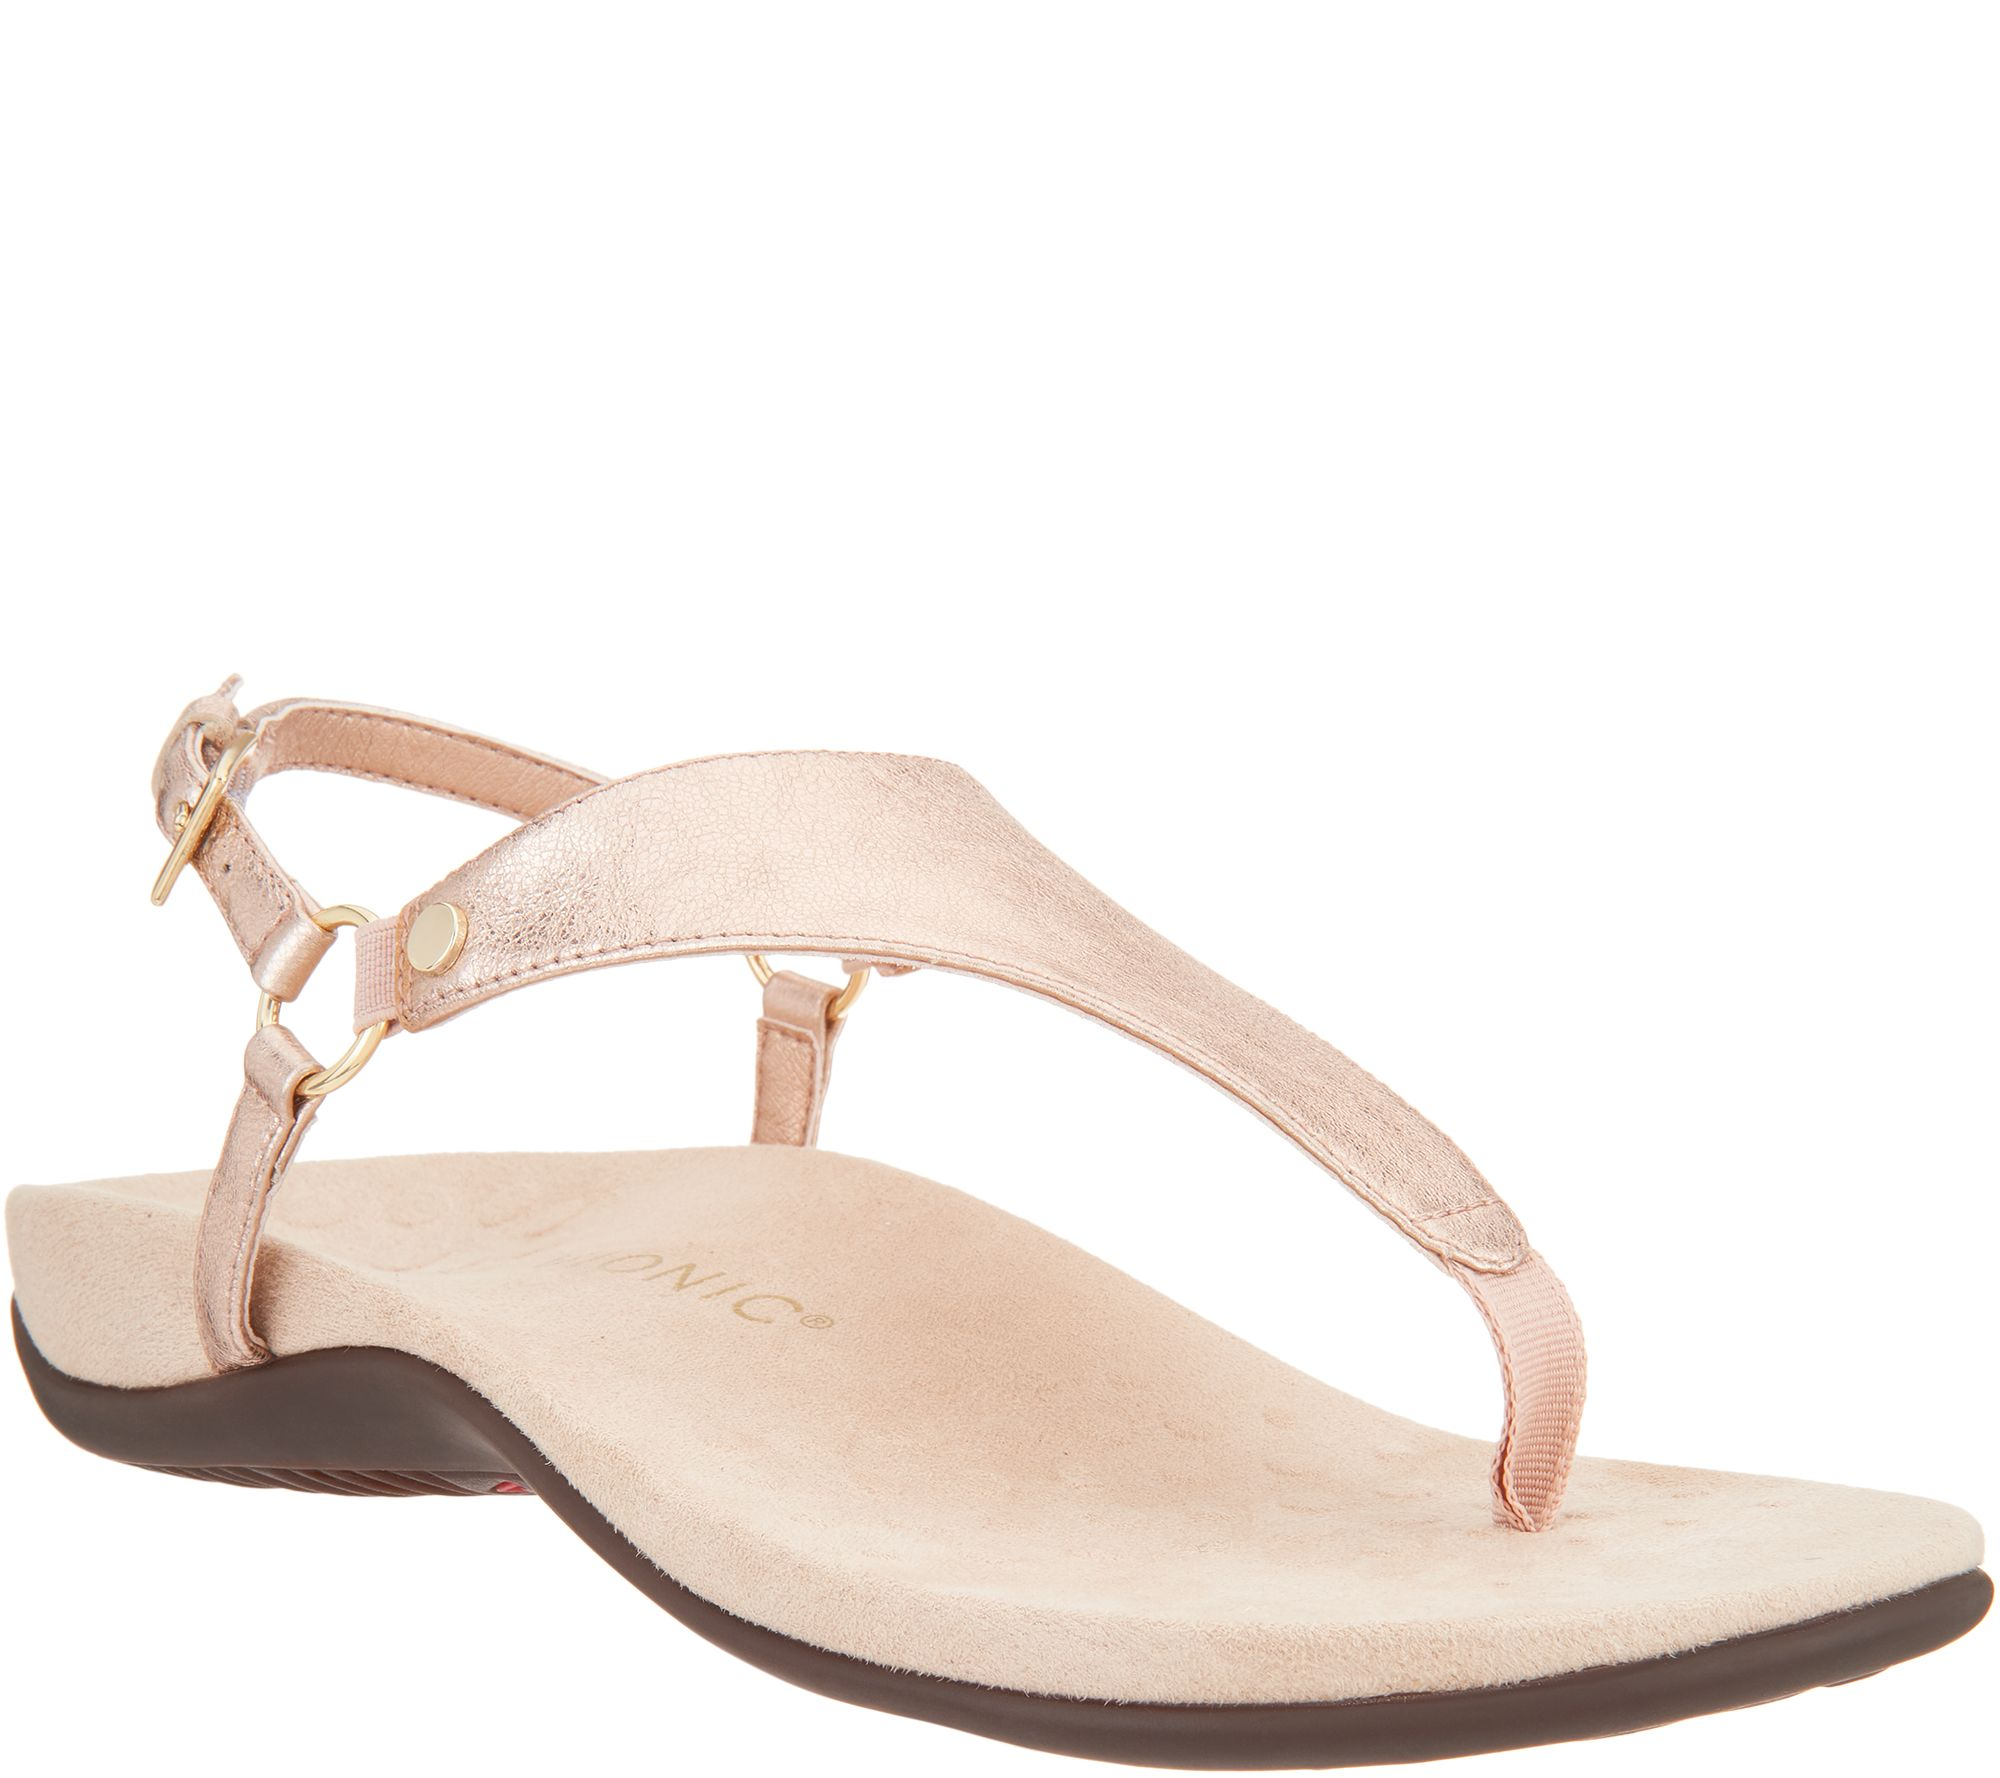 1cab57bd551 Vionic Leather T-Strap Sandals - Kirra Metallic - Page 1 — QVC.com